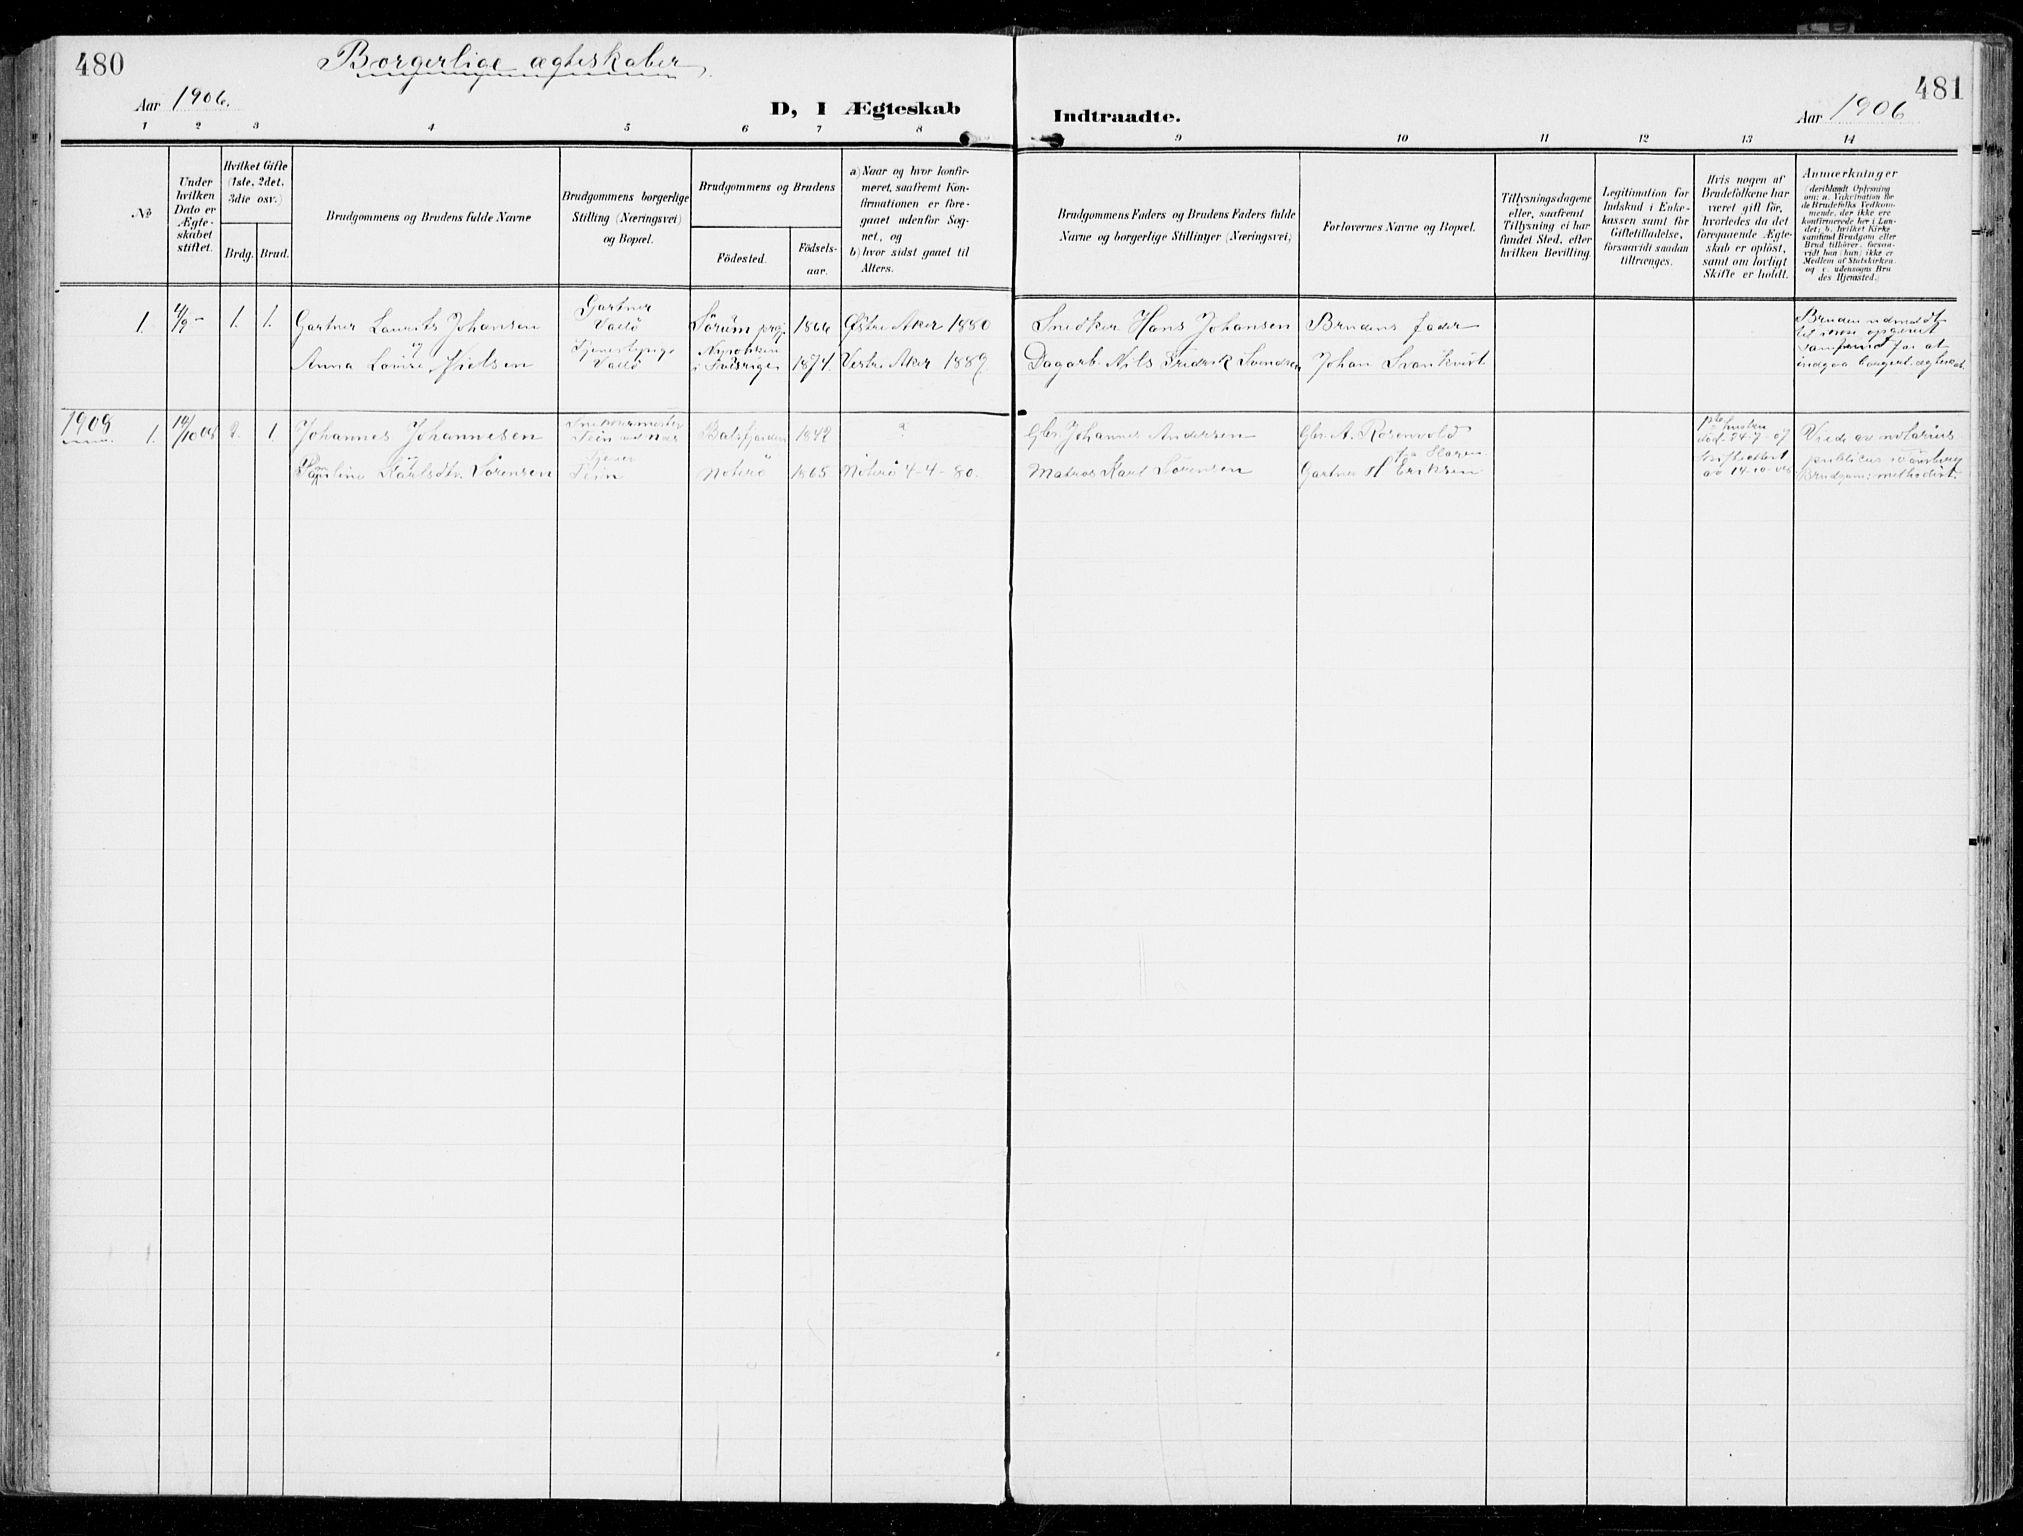 SAKO, Sem kirkebøker, F/Fb/L0006: Ministerialbok nr. II 6, 1905-1918, s. 480-481